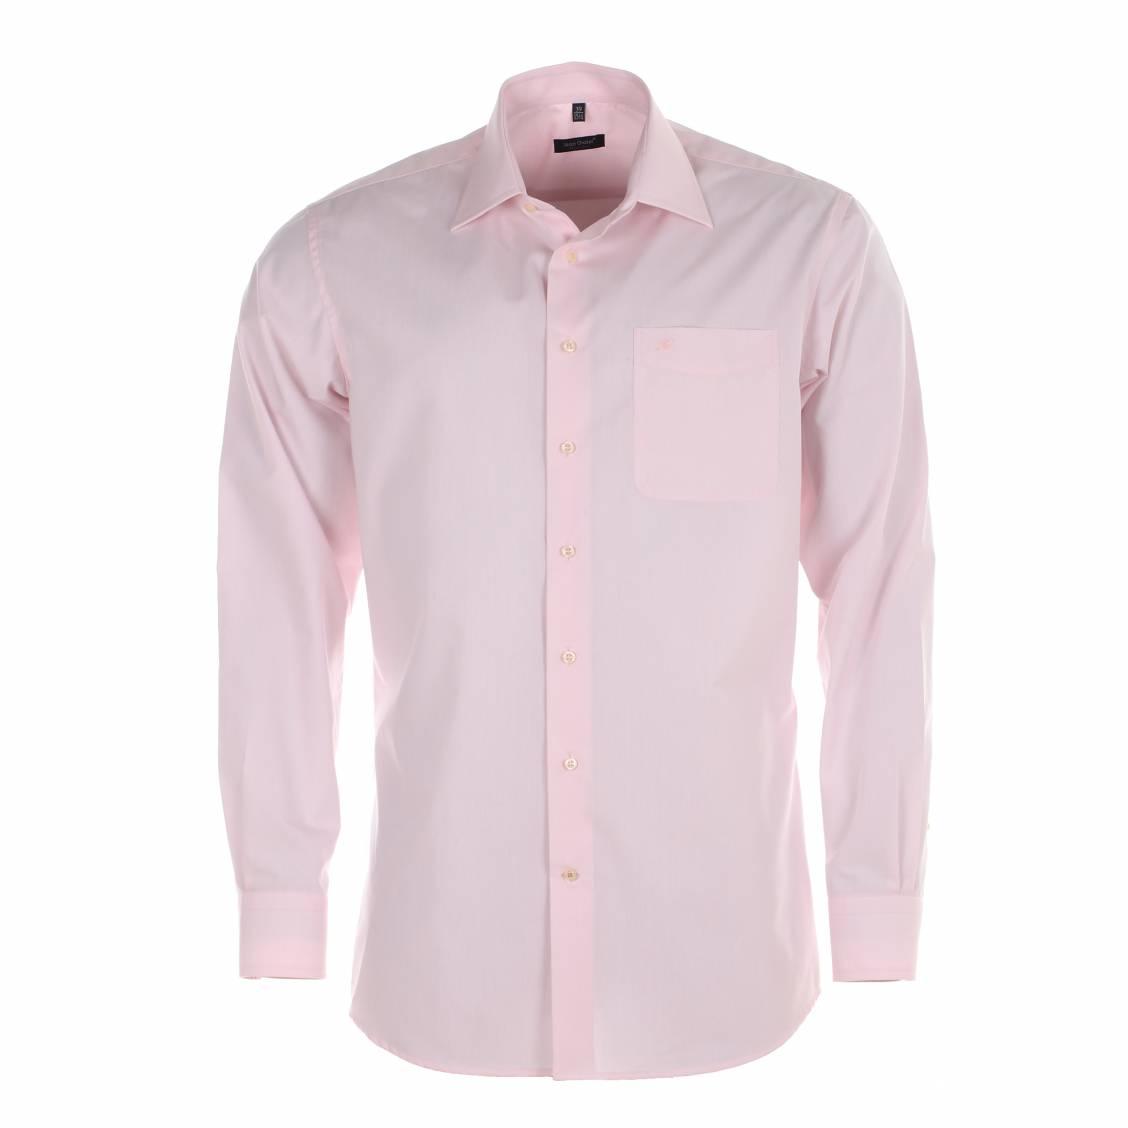 chemise homme sans repassage jean chatel paris rose rue des hommes. Black Bedroom Furniture Sets. Home Design Ideas